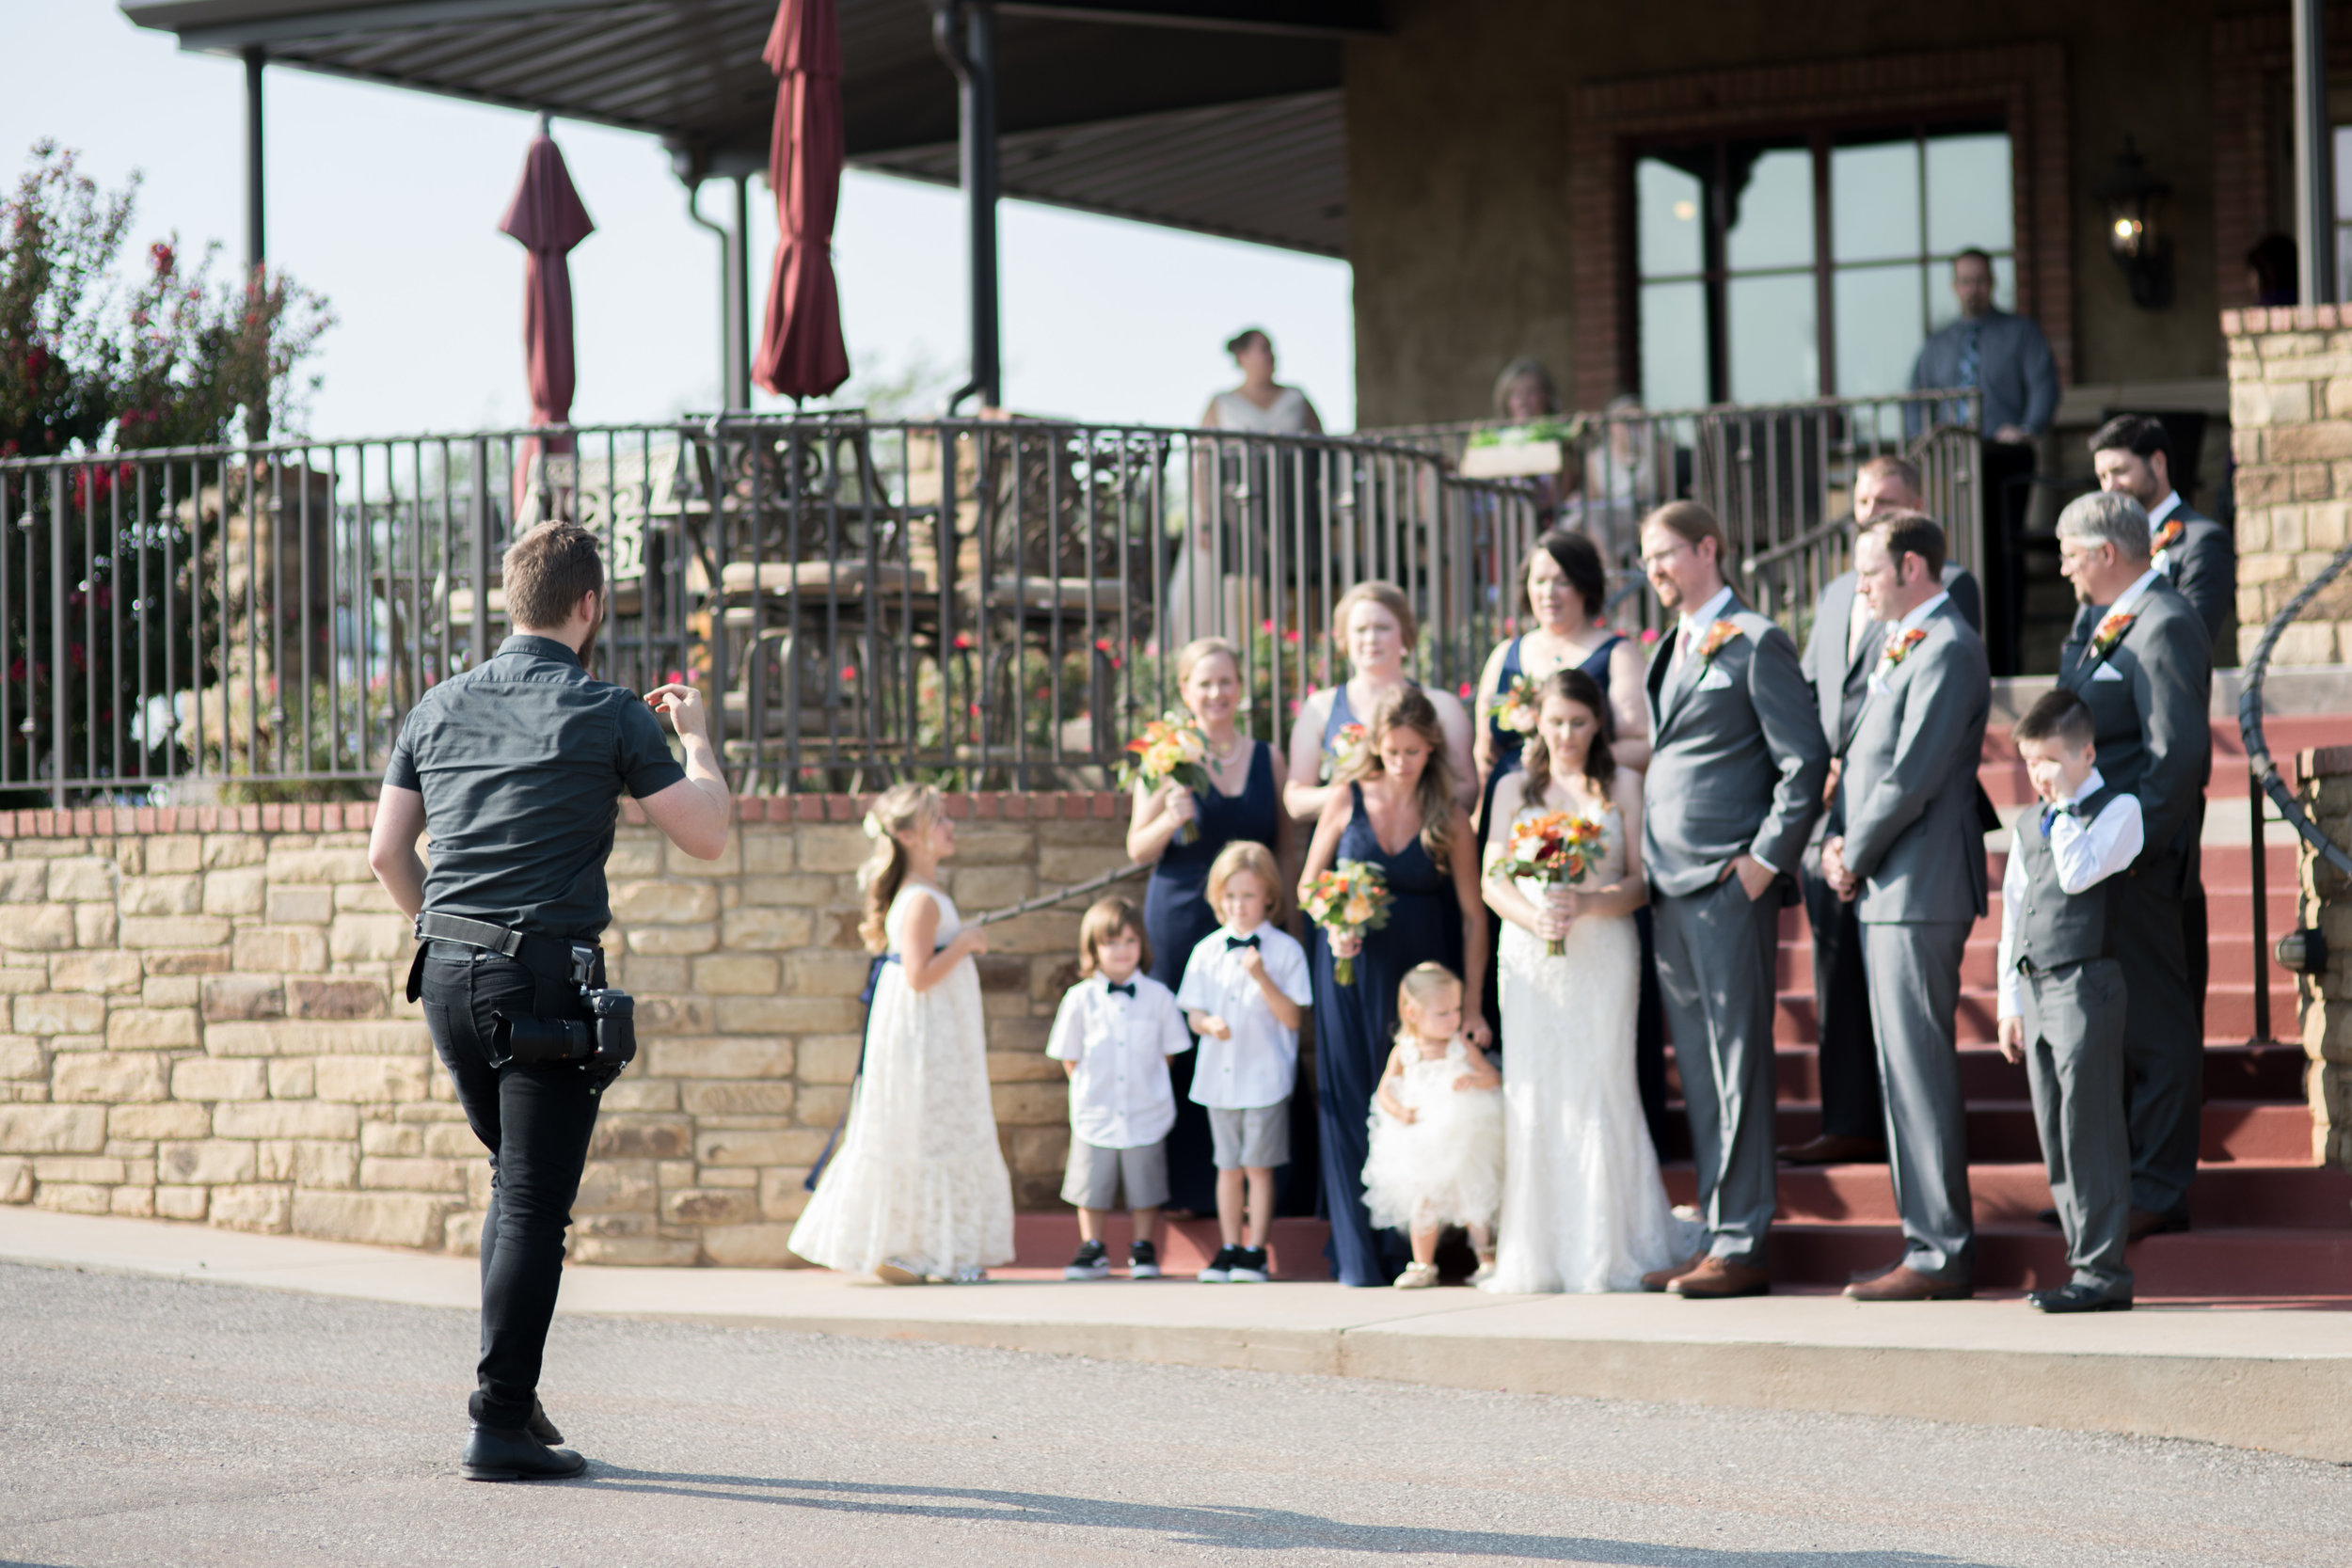 2017 Pearce Wedding03.jpg